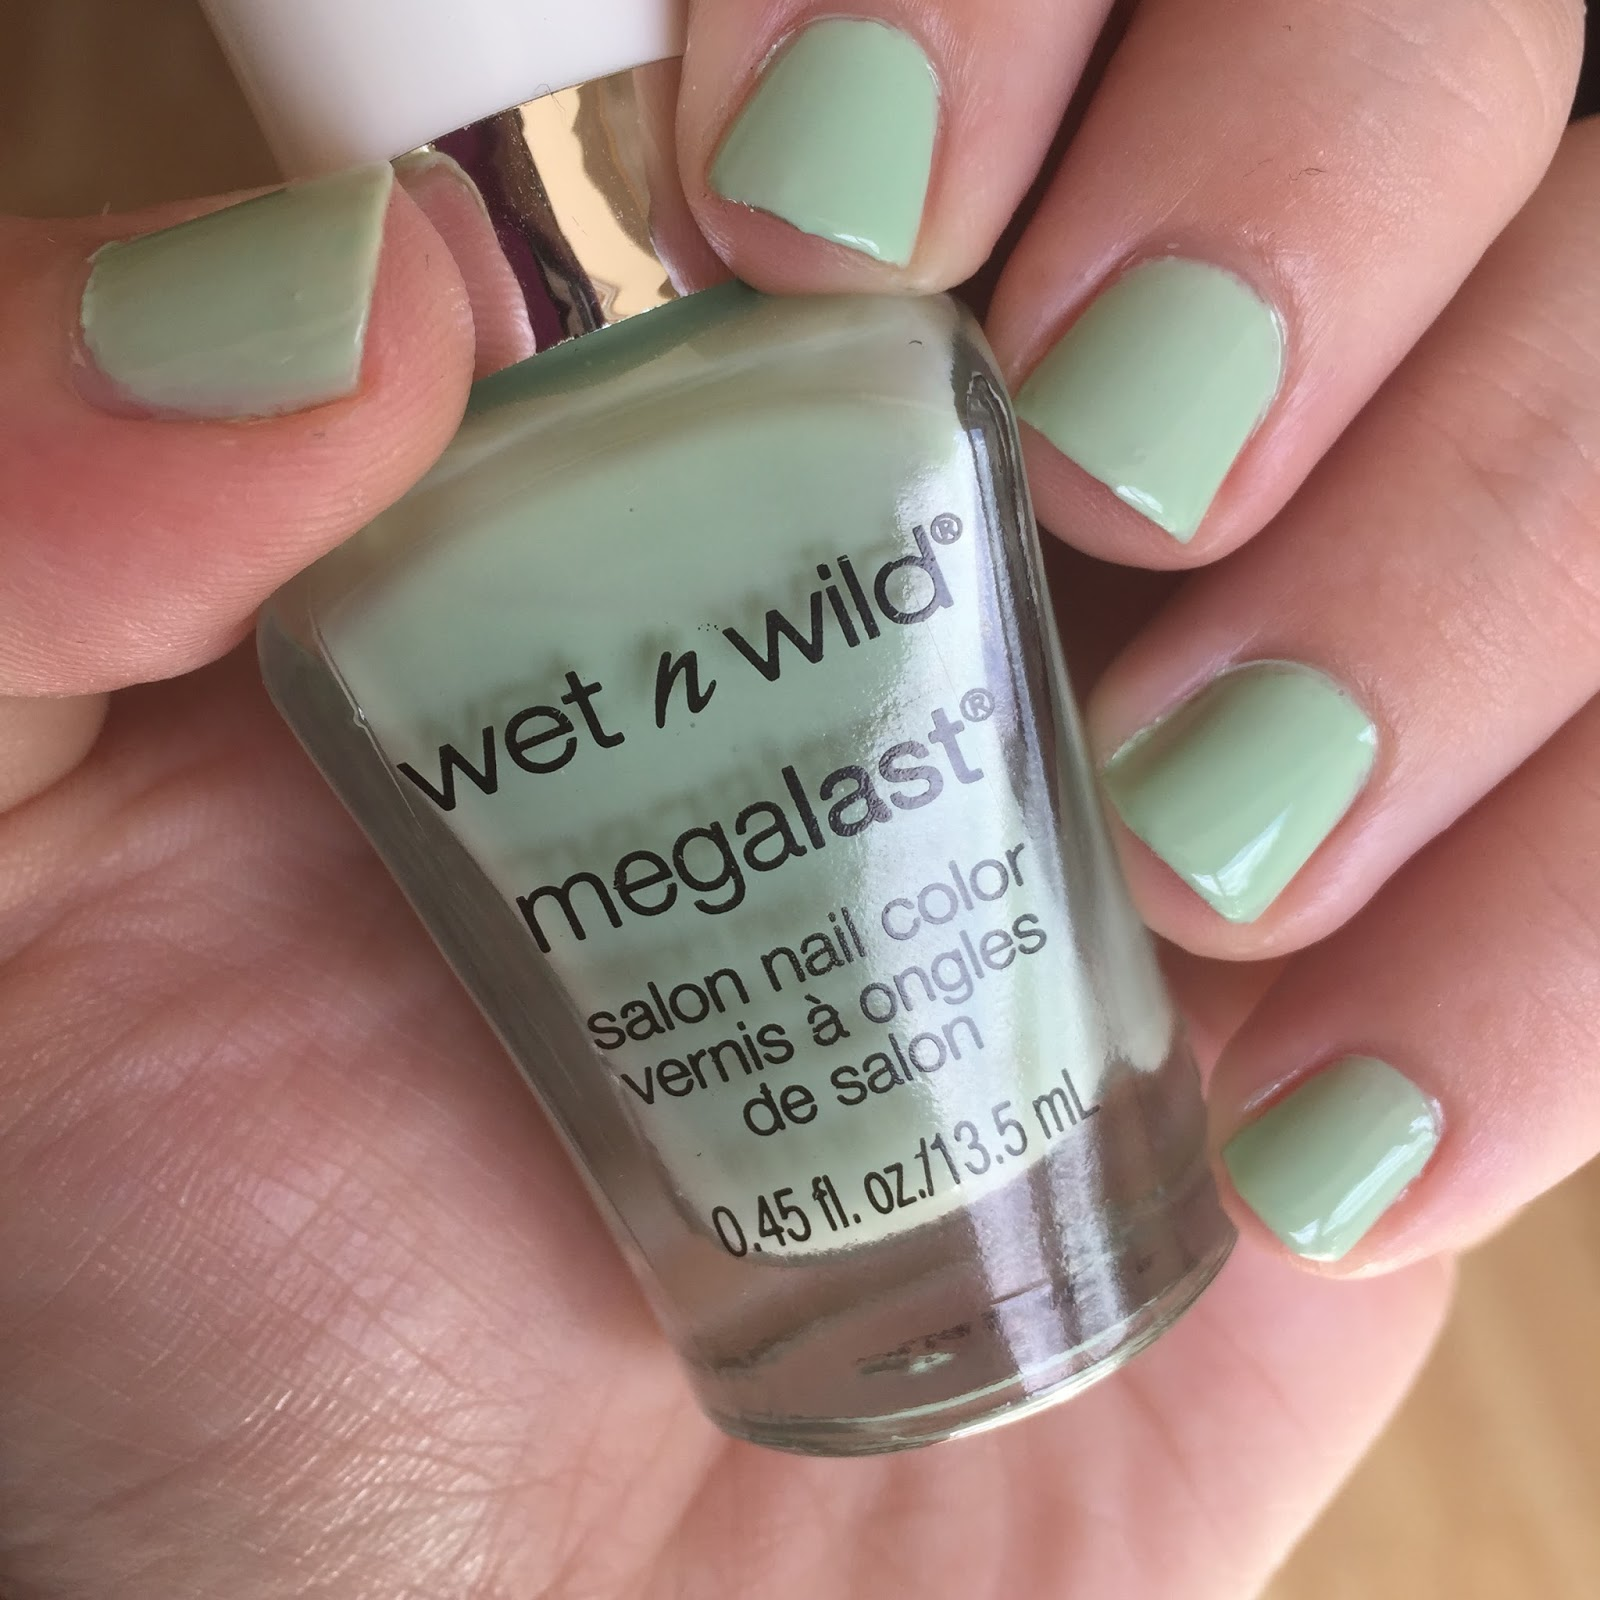 Wet N Wild Megalast Nail Polishes